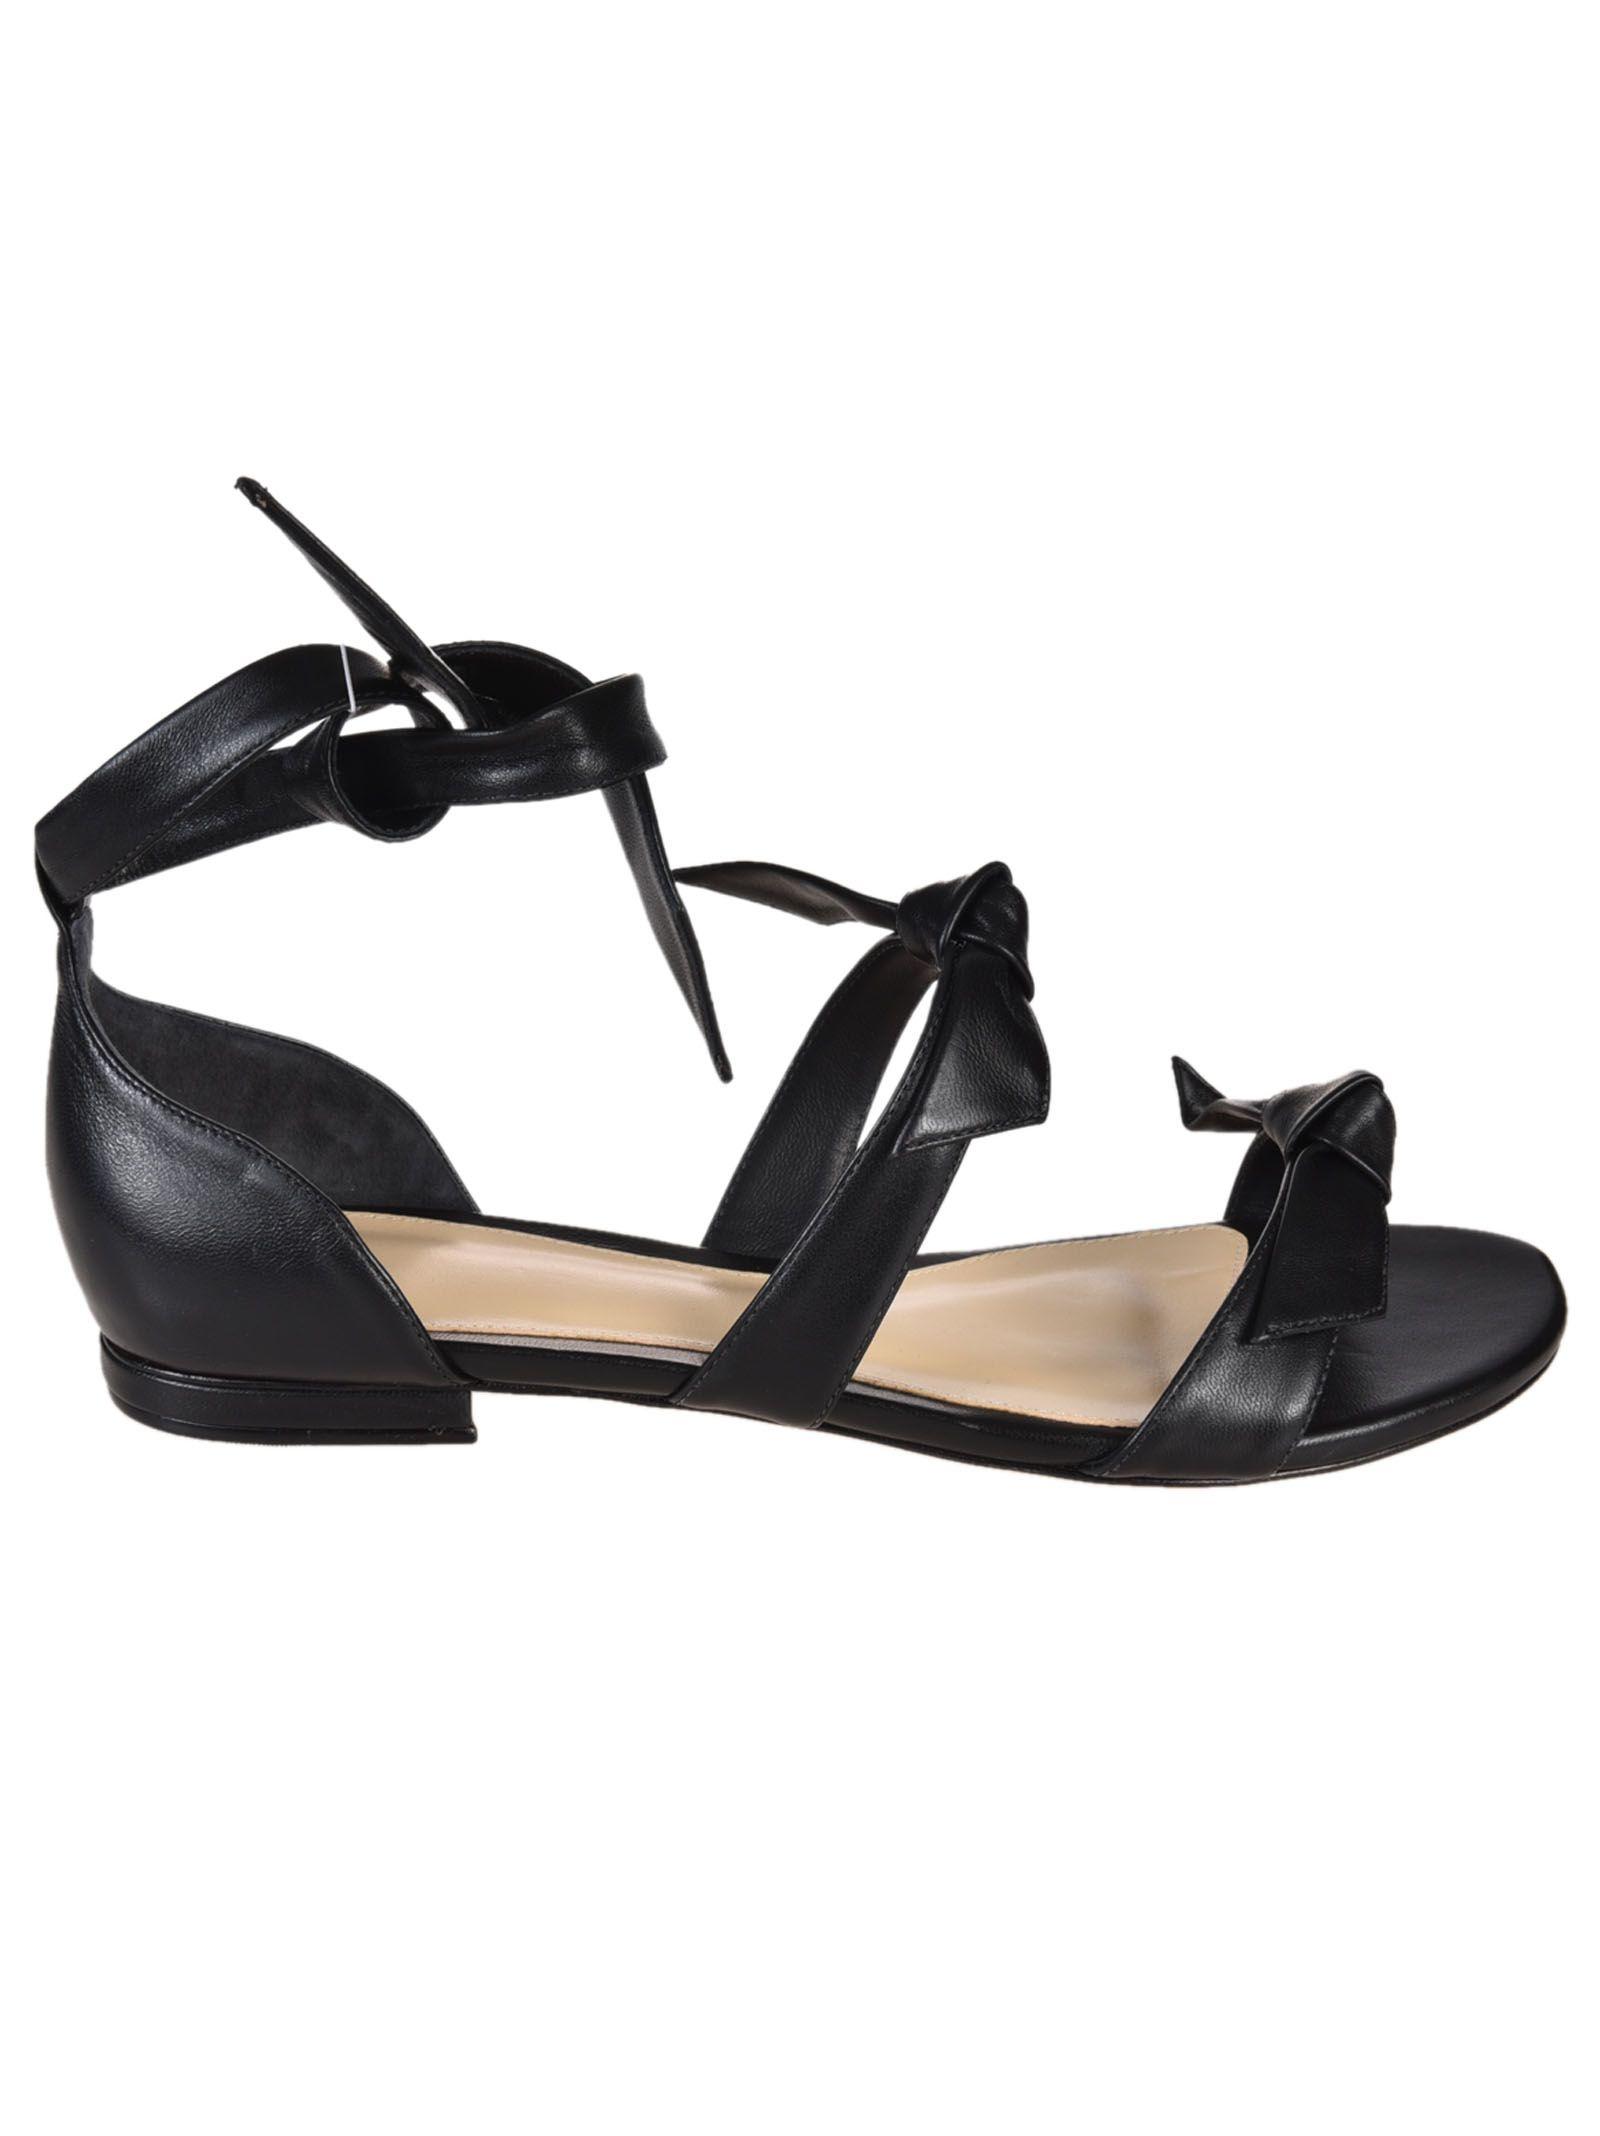 Alexandre Birman Bow Flat Sandals